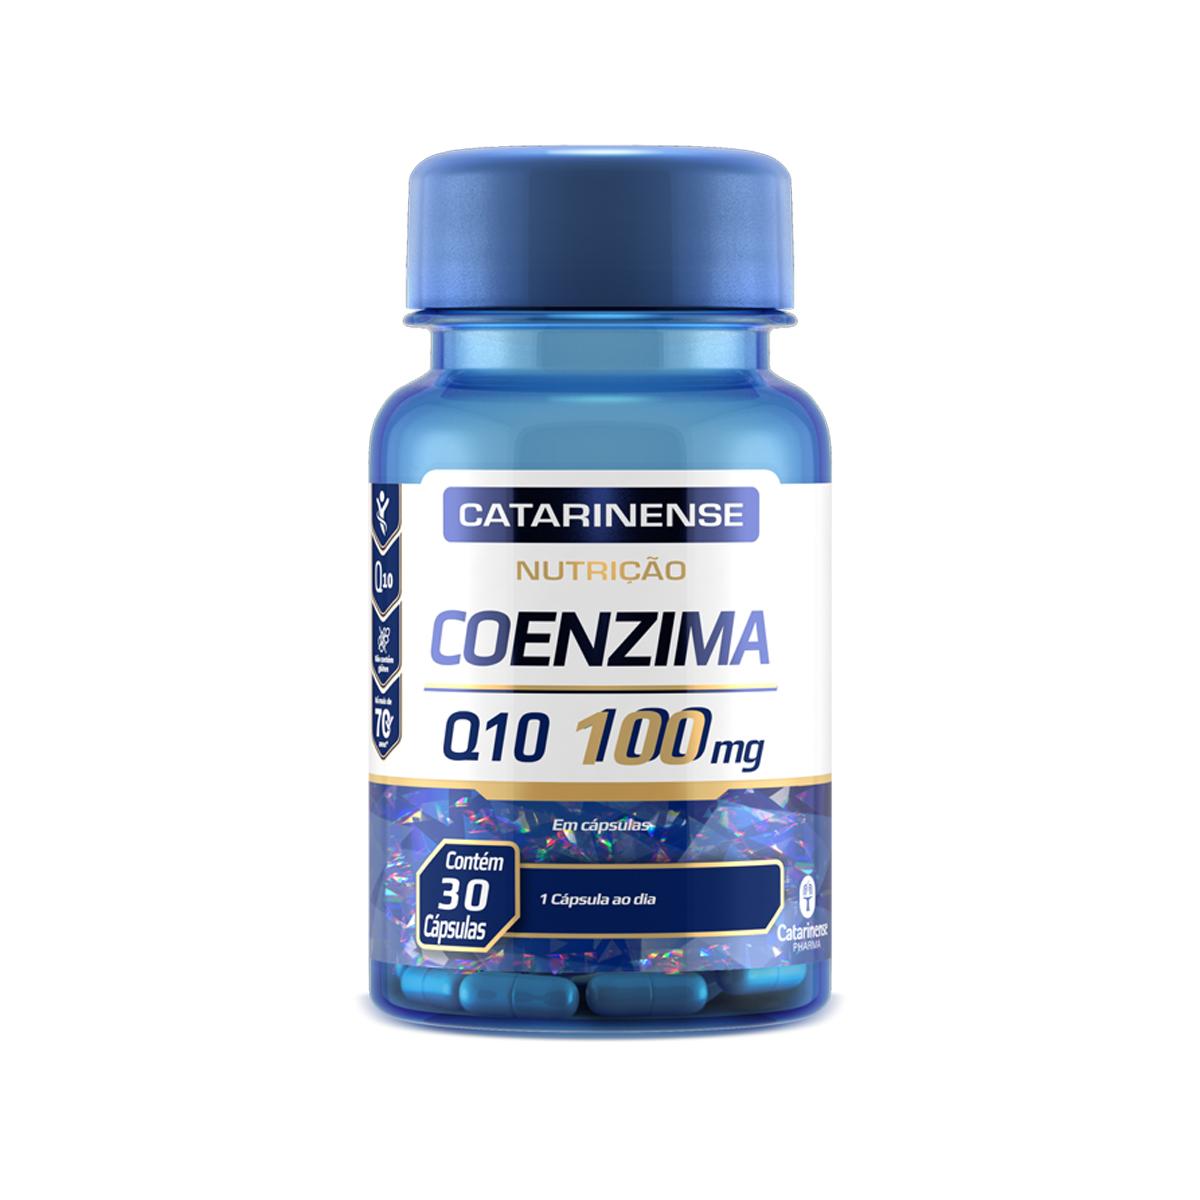 Coenzima Q10 100mg 30 Cápsulas- Catarinense